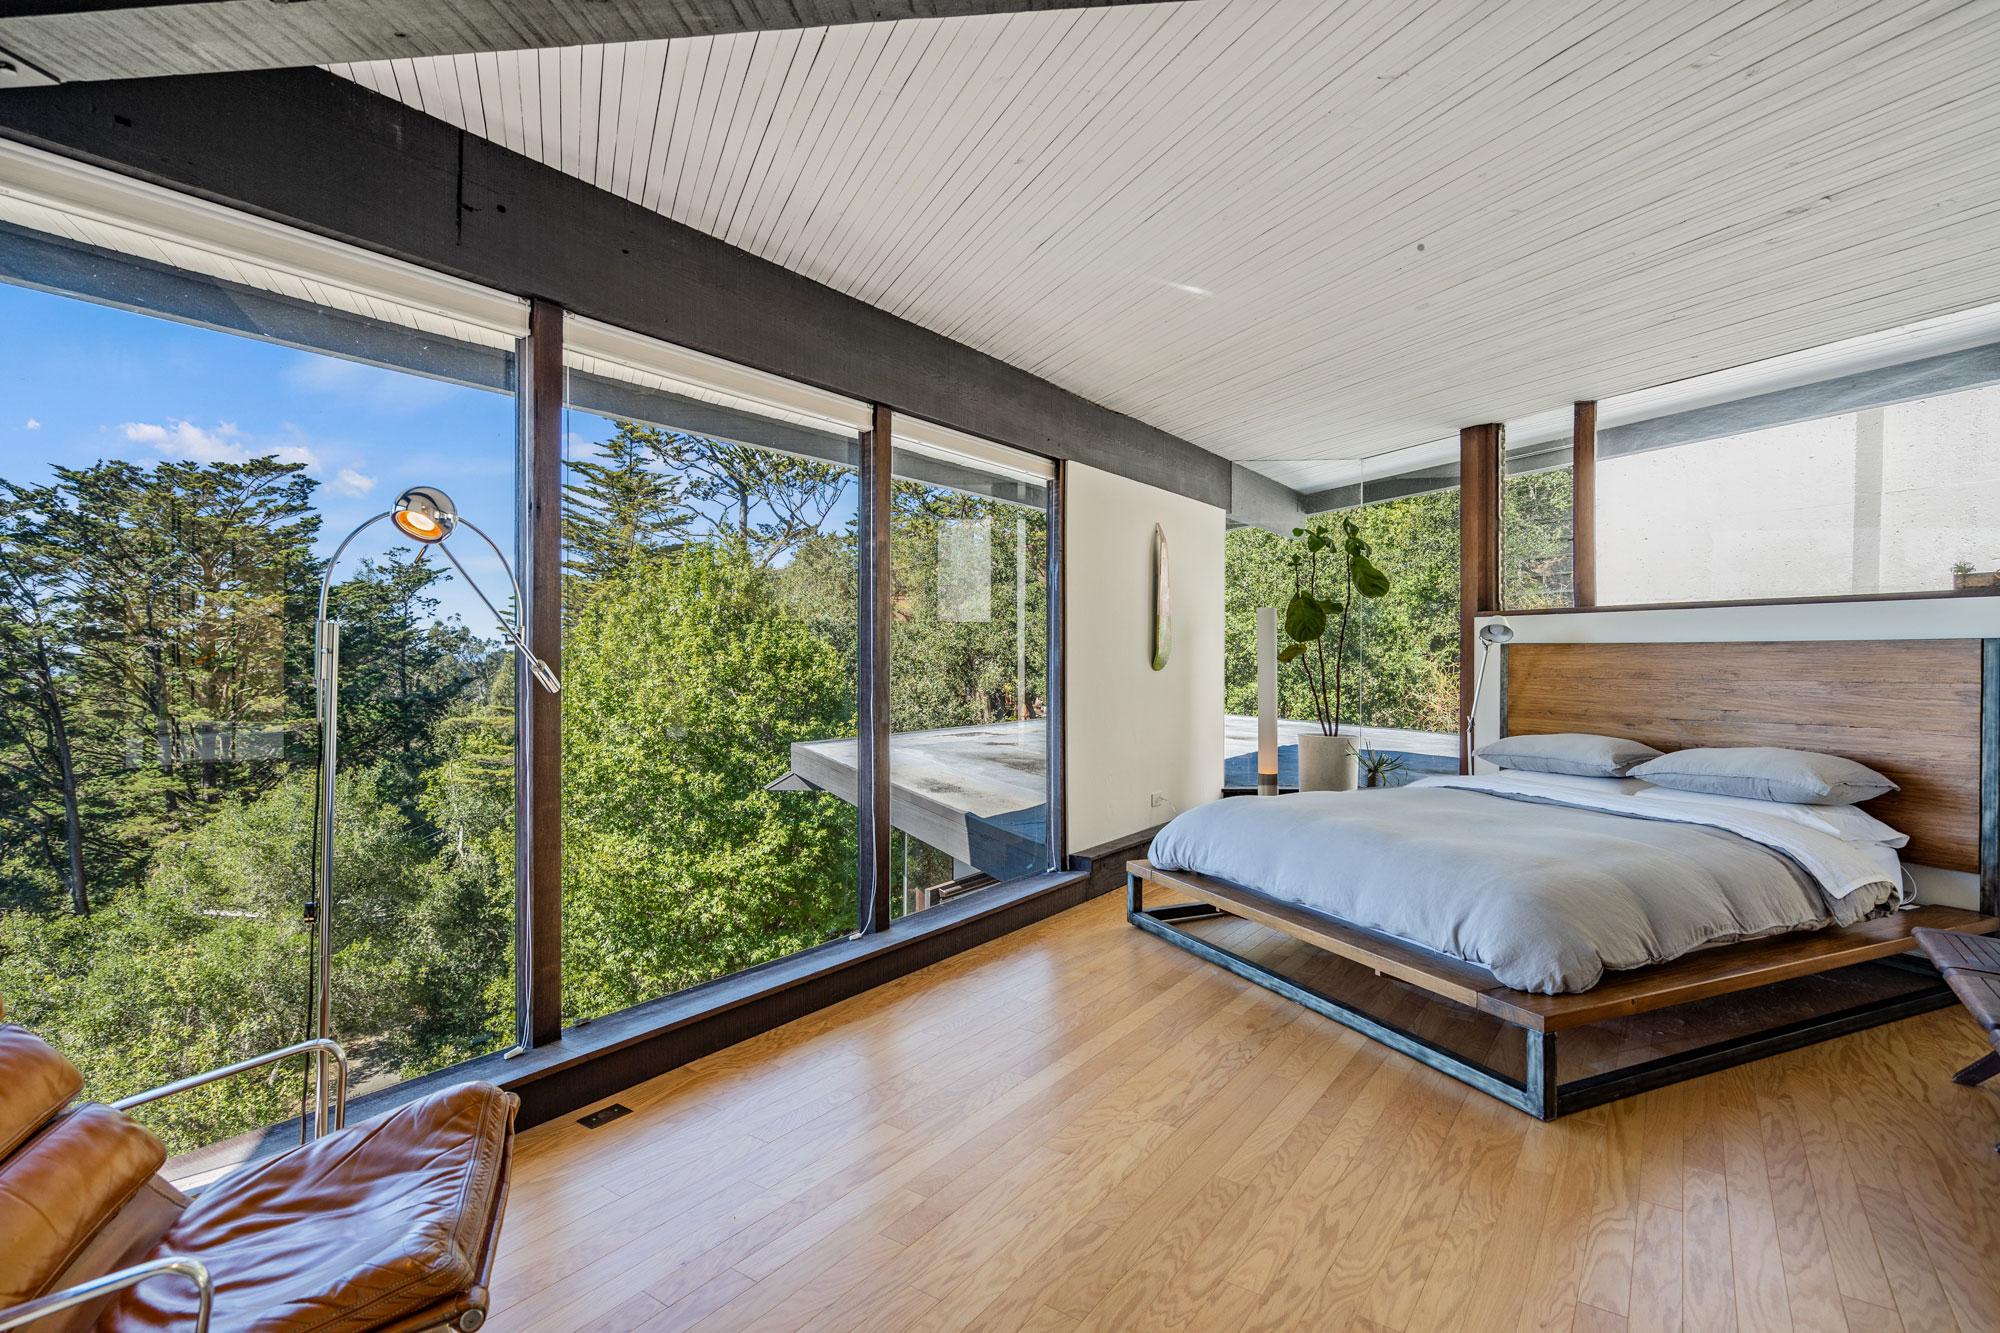 Benjamin Fishstein's midcentury modern house is for sale in California